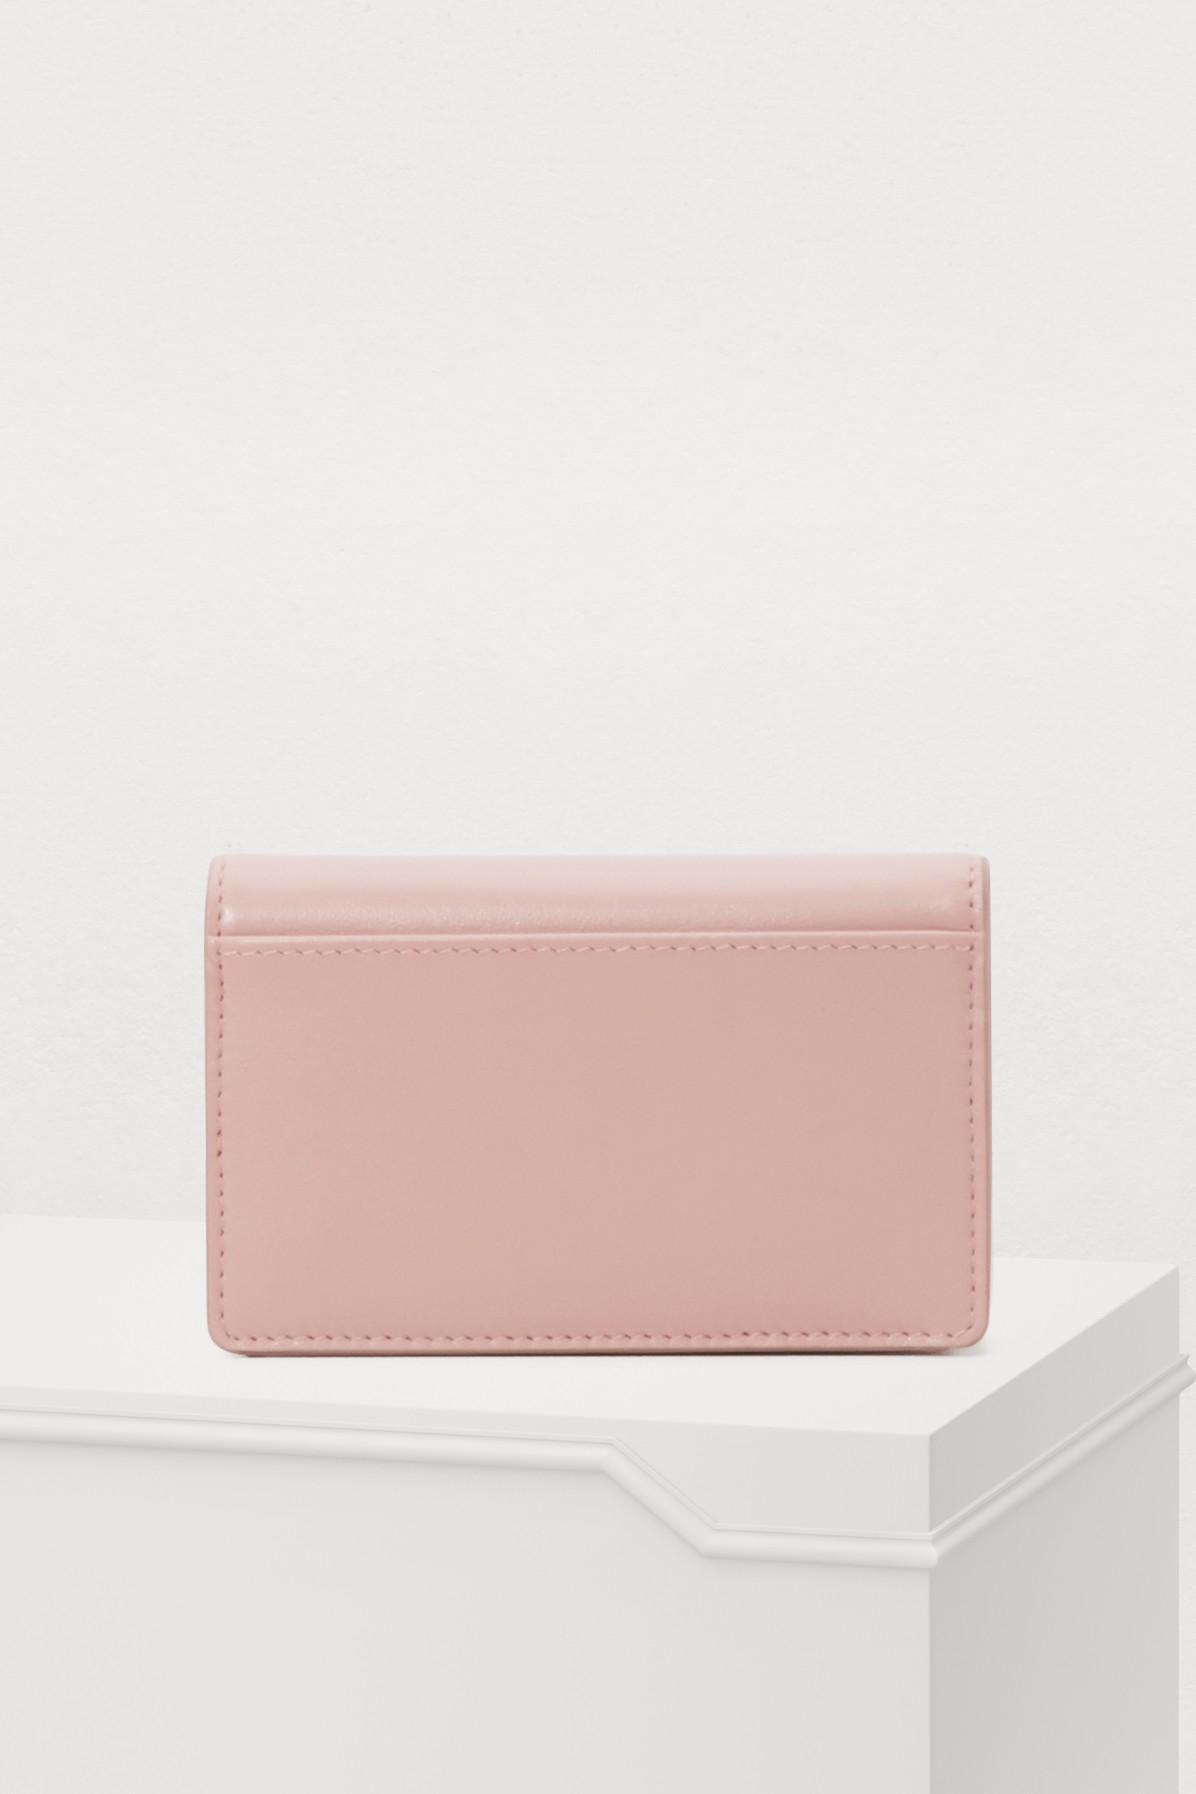 576df1285e66 Miu Miu - Pink Bow Cardholder - Lyst. View fullscreen